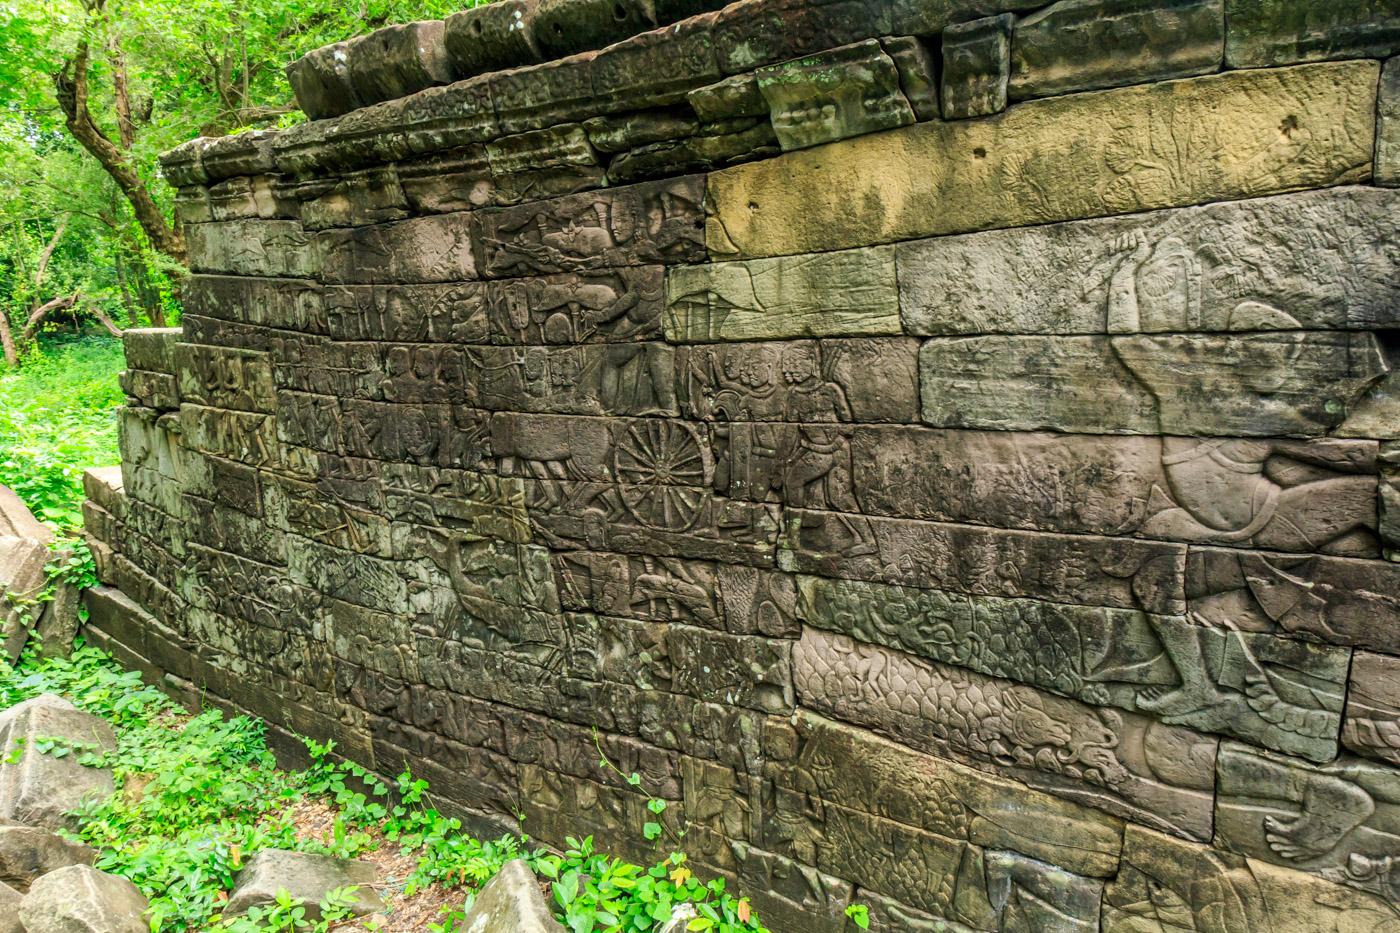 Remarkable bas-reliefs.